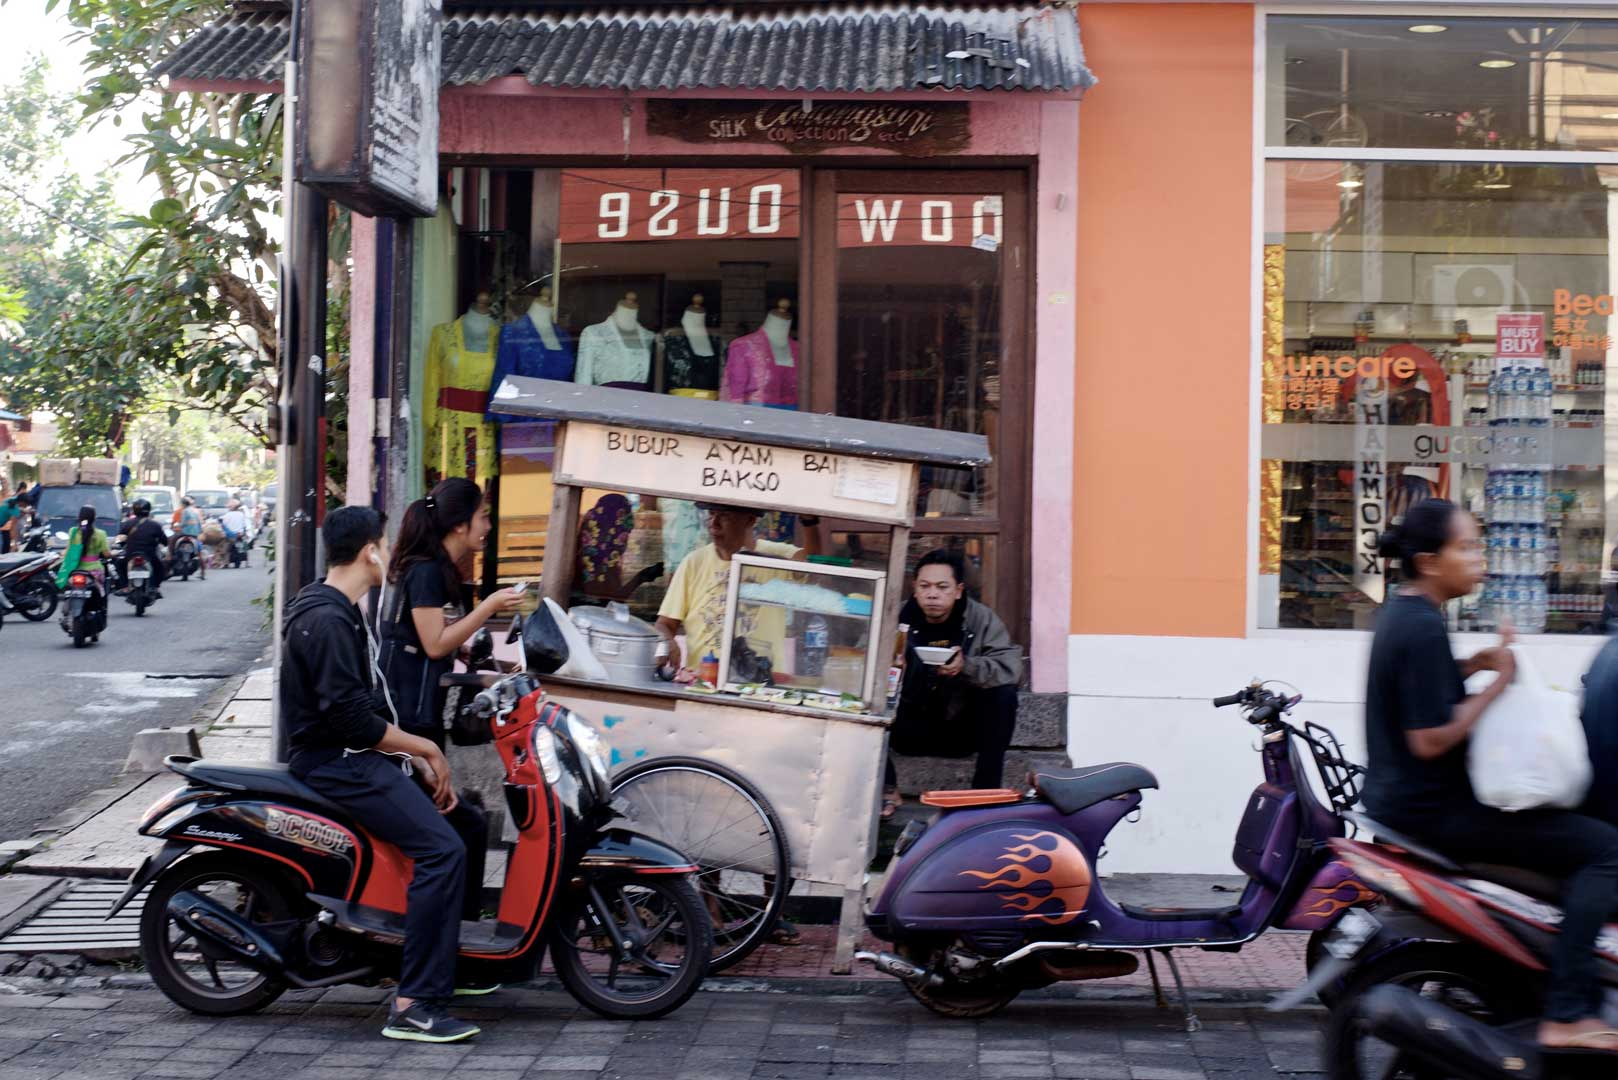 Kaki Lima Bali Street Photographer Tour Transport Di Or Five Legs Food Vendor